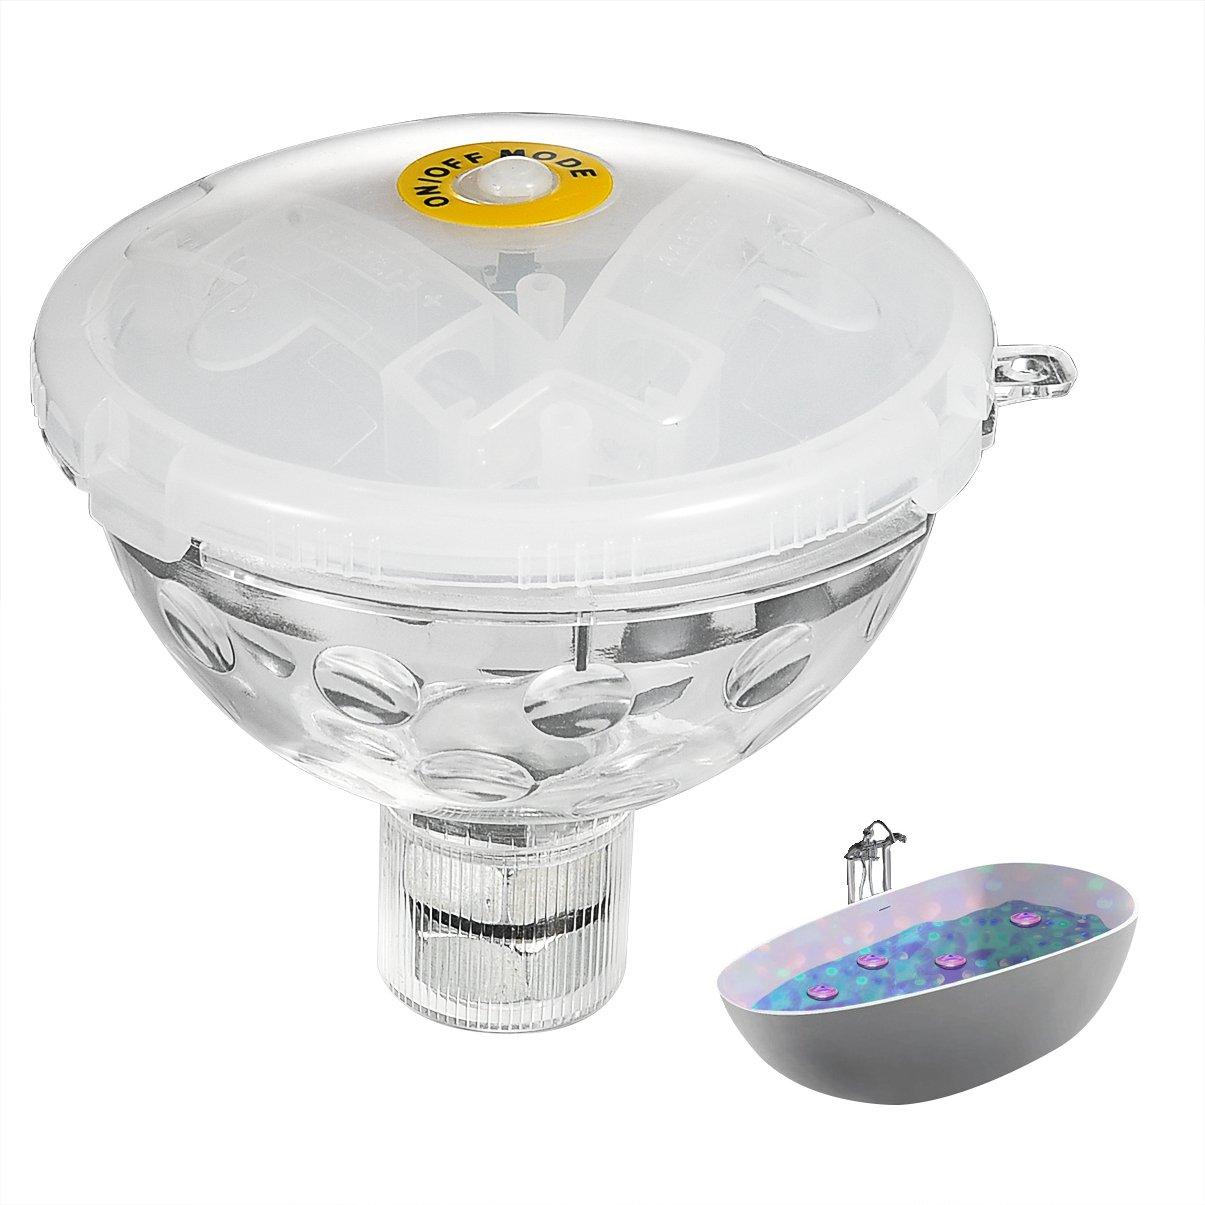 LEDGLE LED Colour Changing Light for Bathtub or Spa Bathtub Lights, Waterproof IP68,Battery Powered,5 Flash Modes